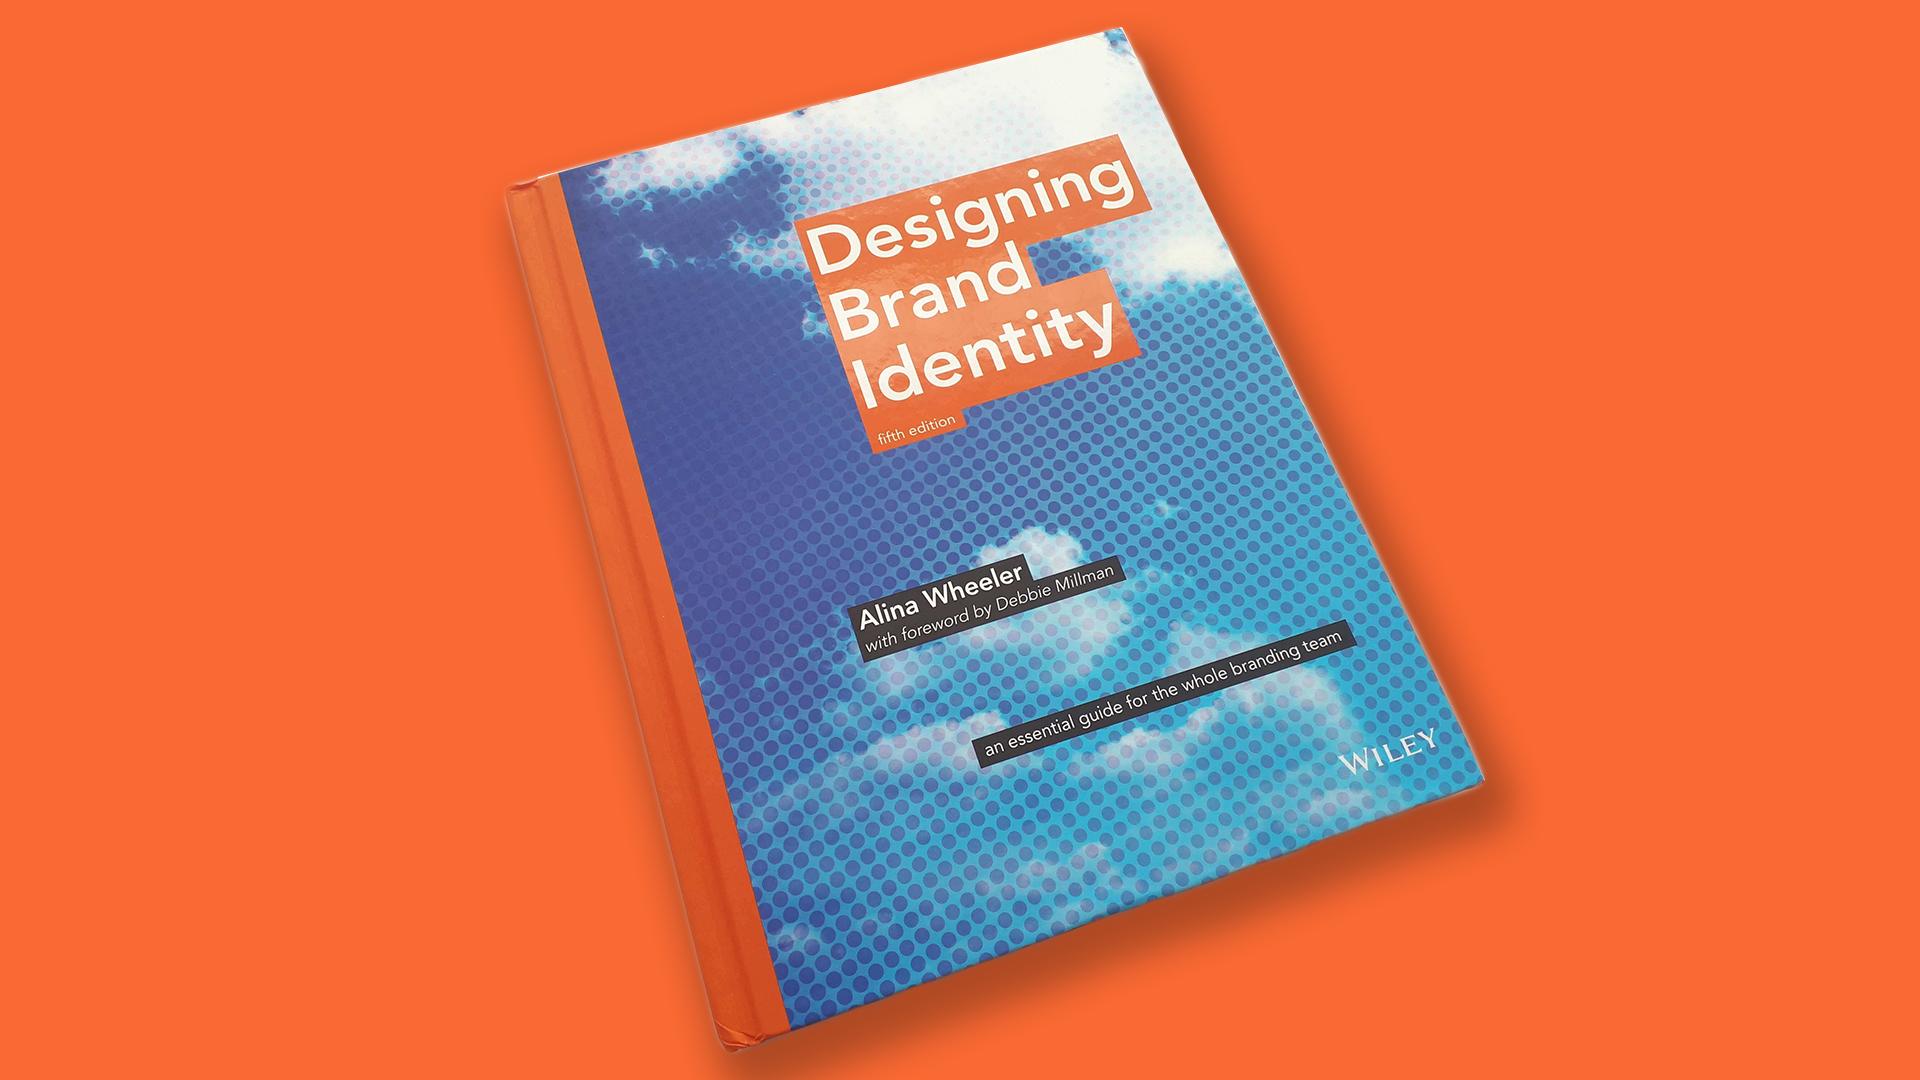 Designing Brand Identity Book By Alina Wheeler 3